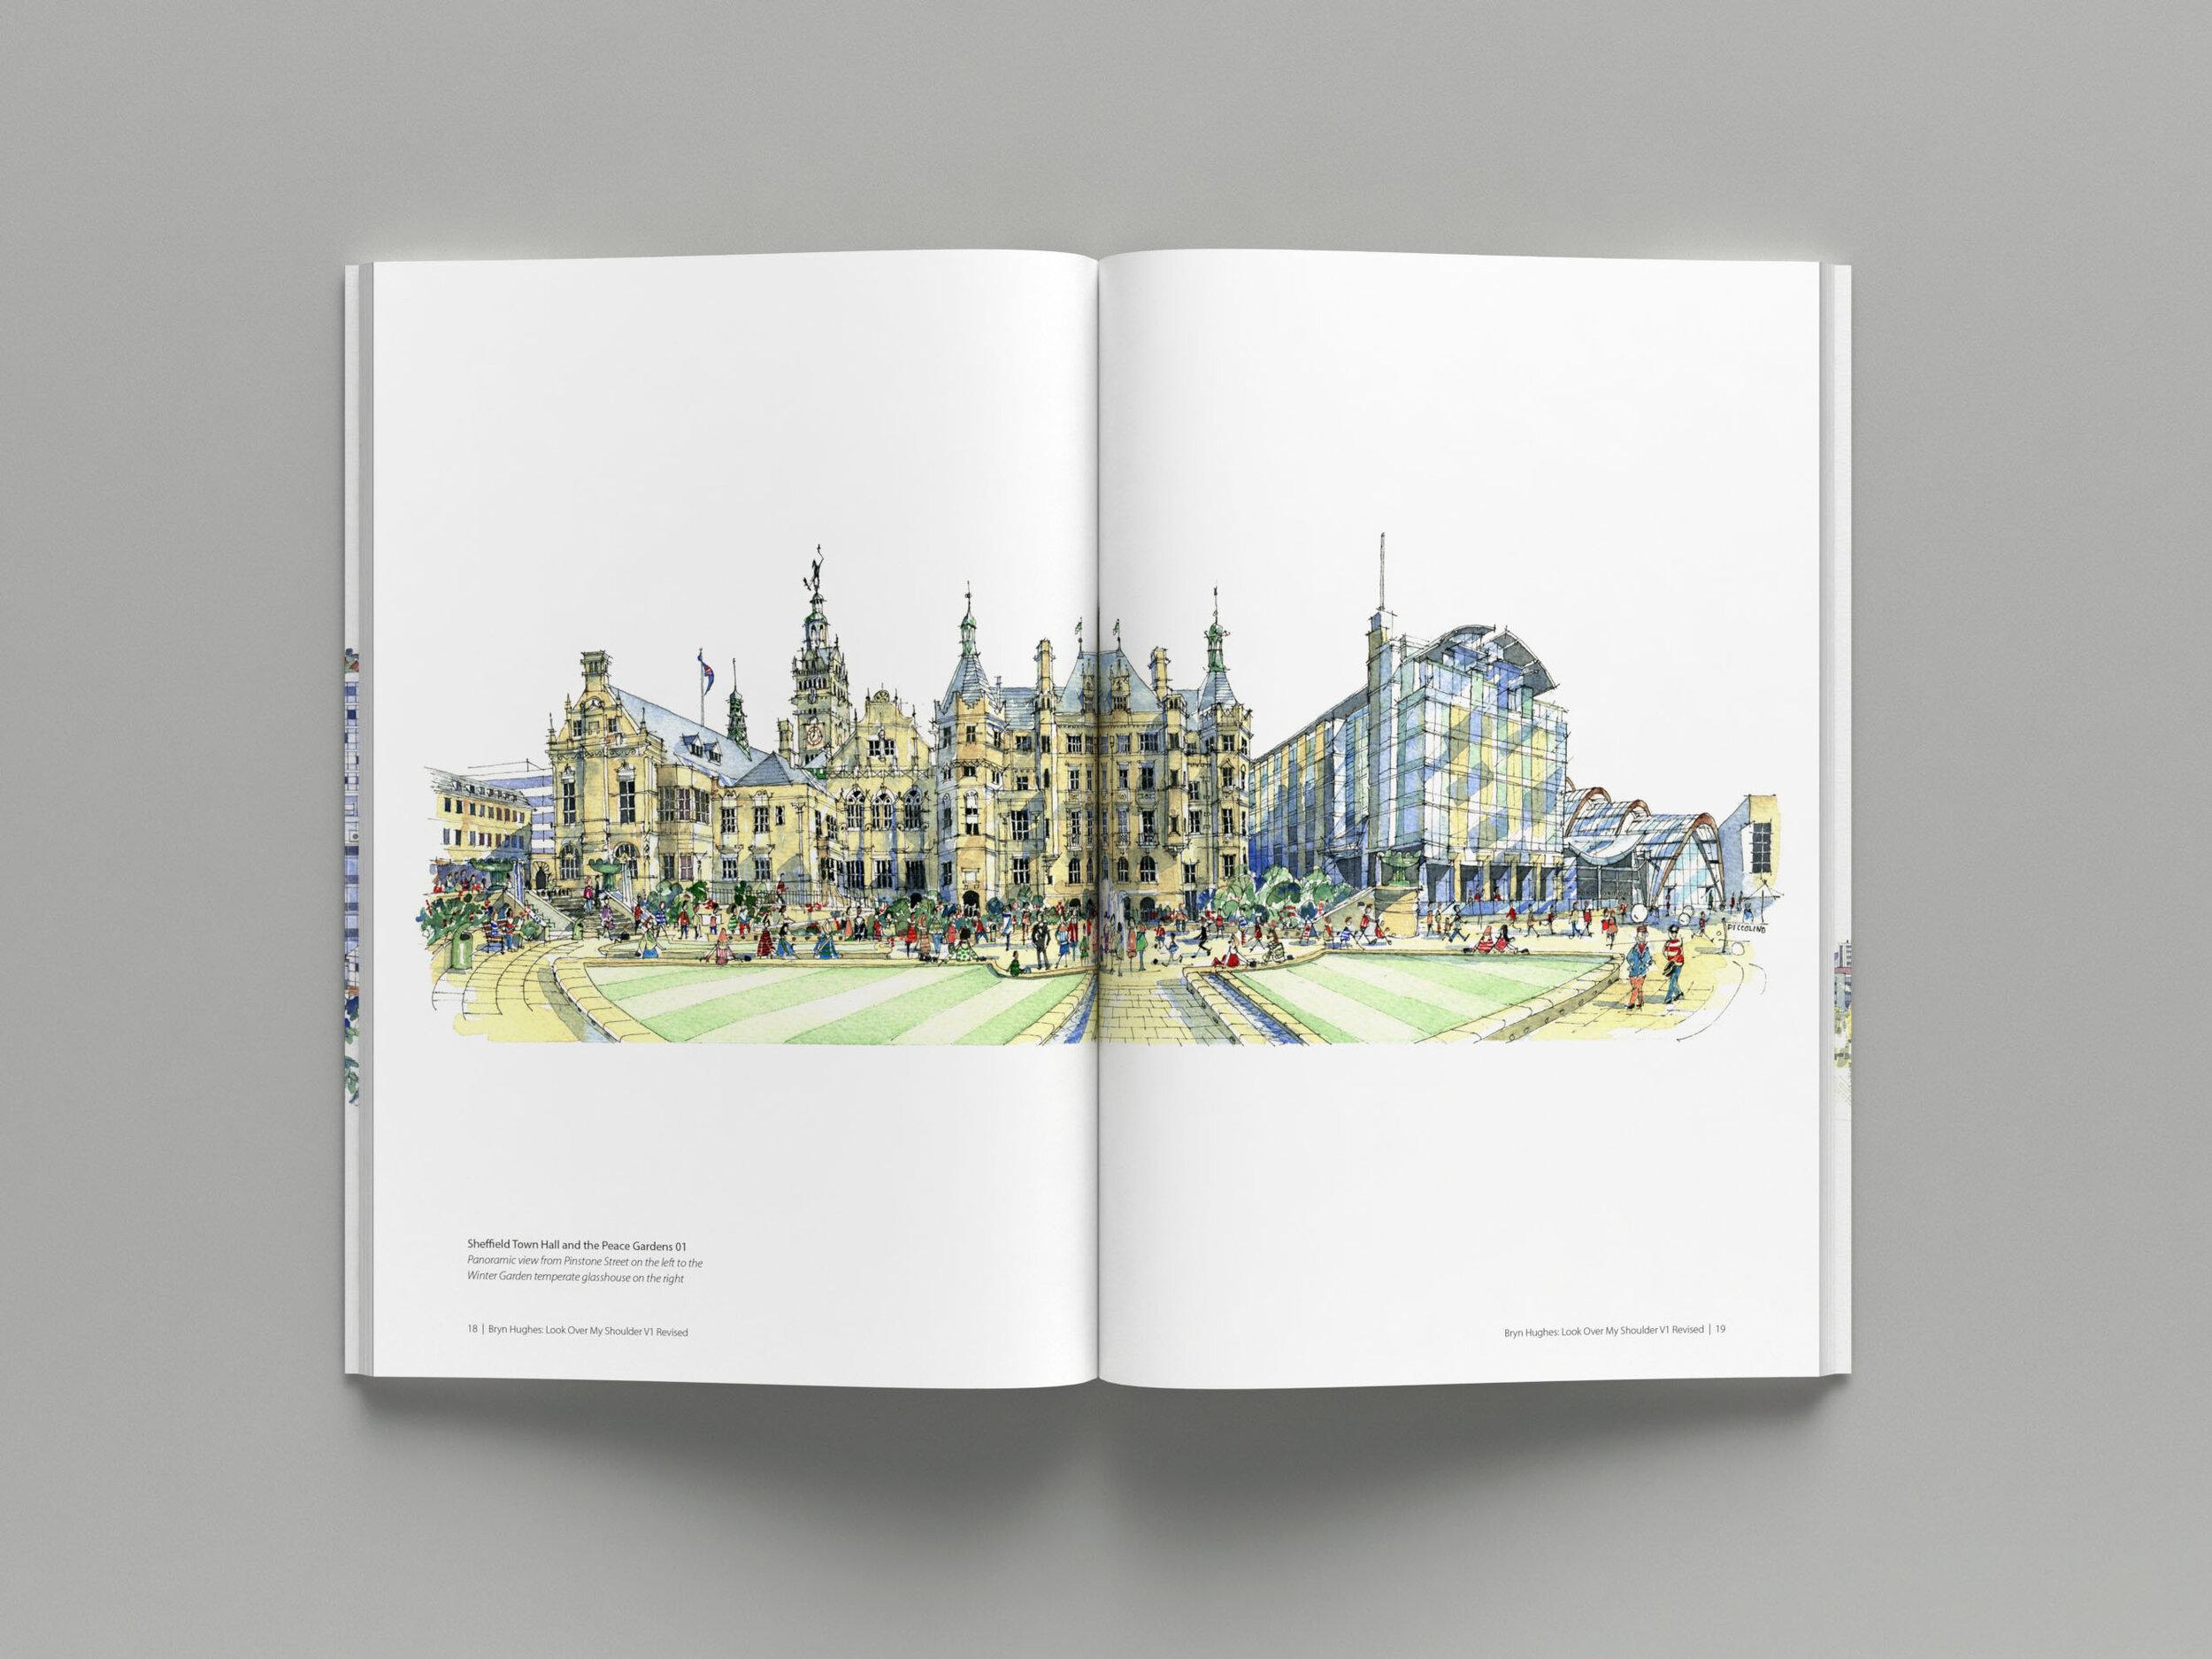 BRYN-HUGHES-ARTIST-SOFTBACK-BOOK02-B-_0032_Group 10.jpg